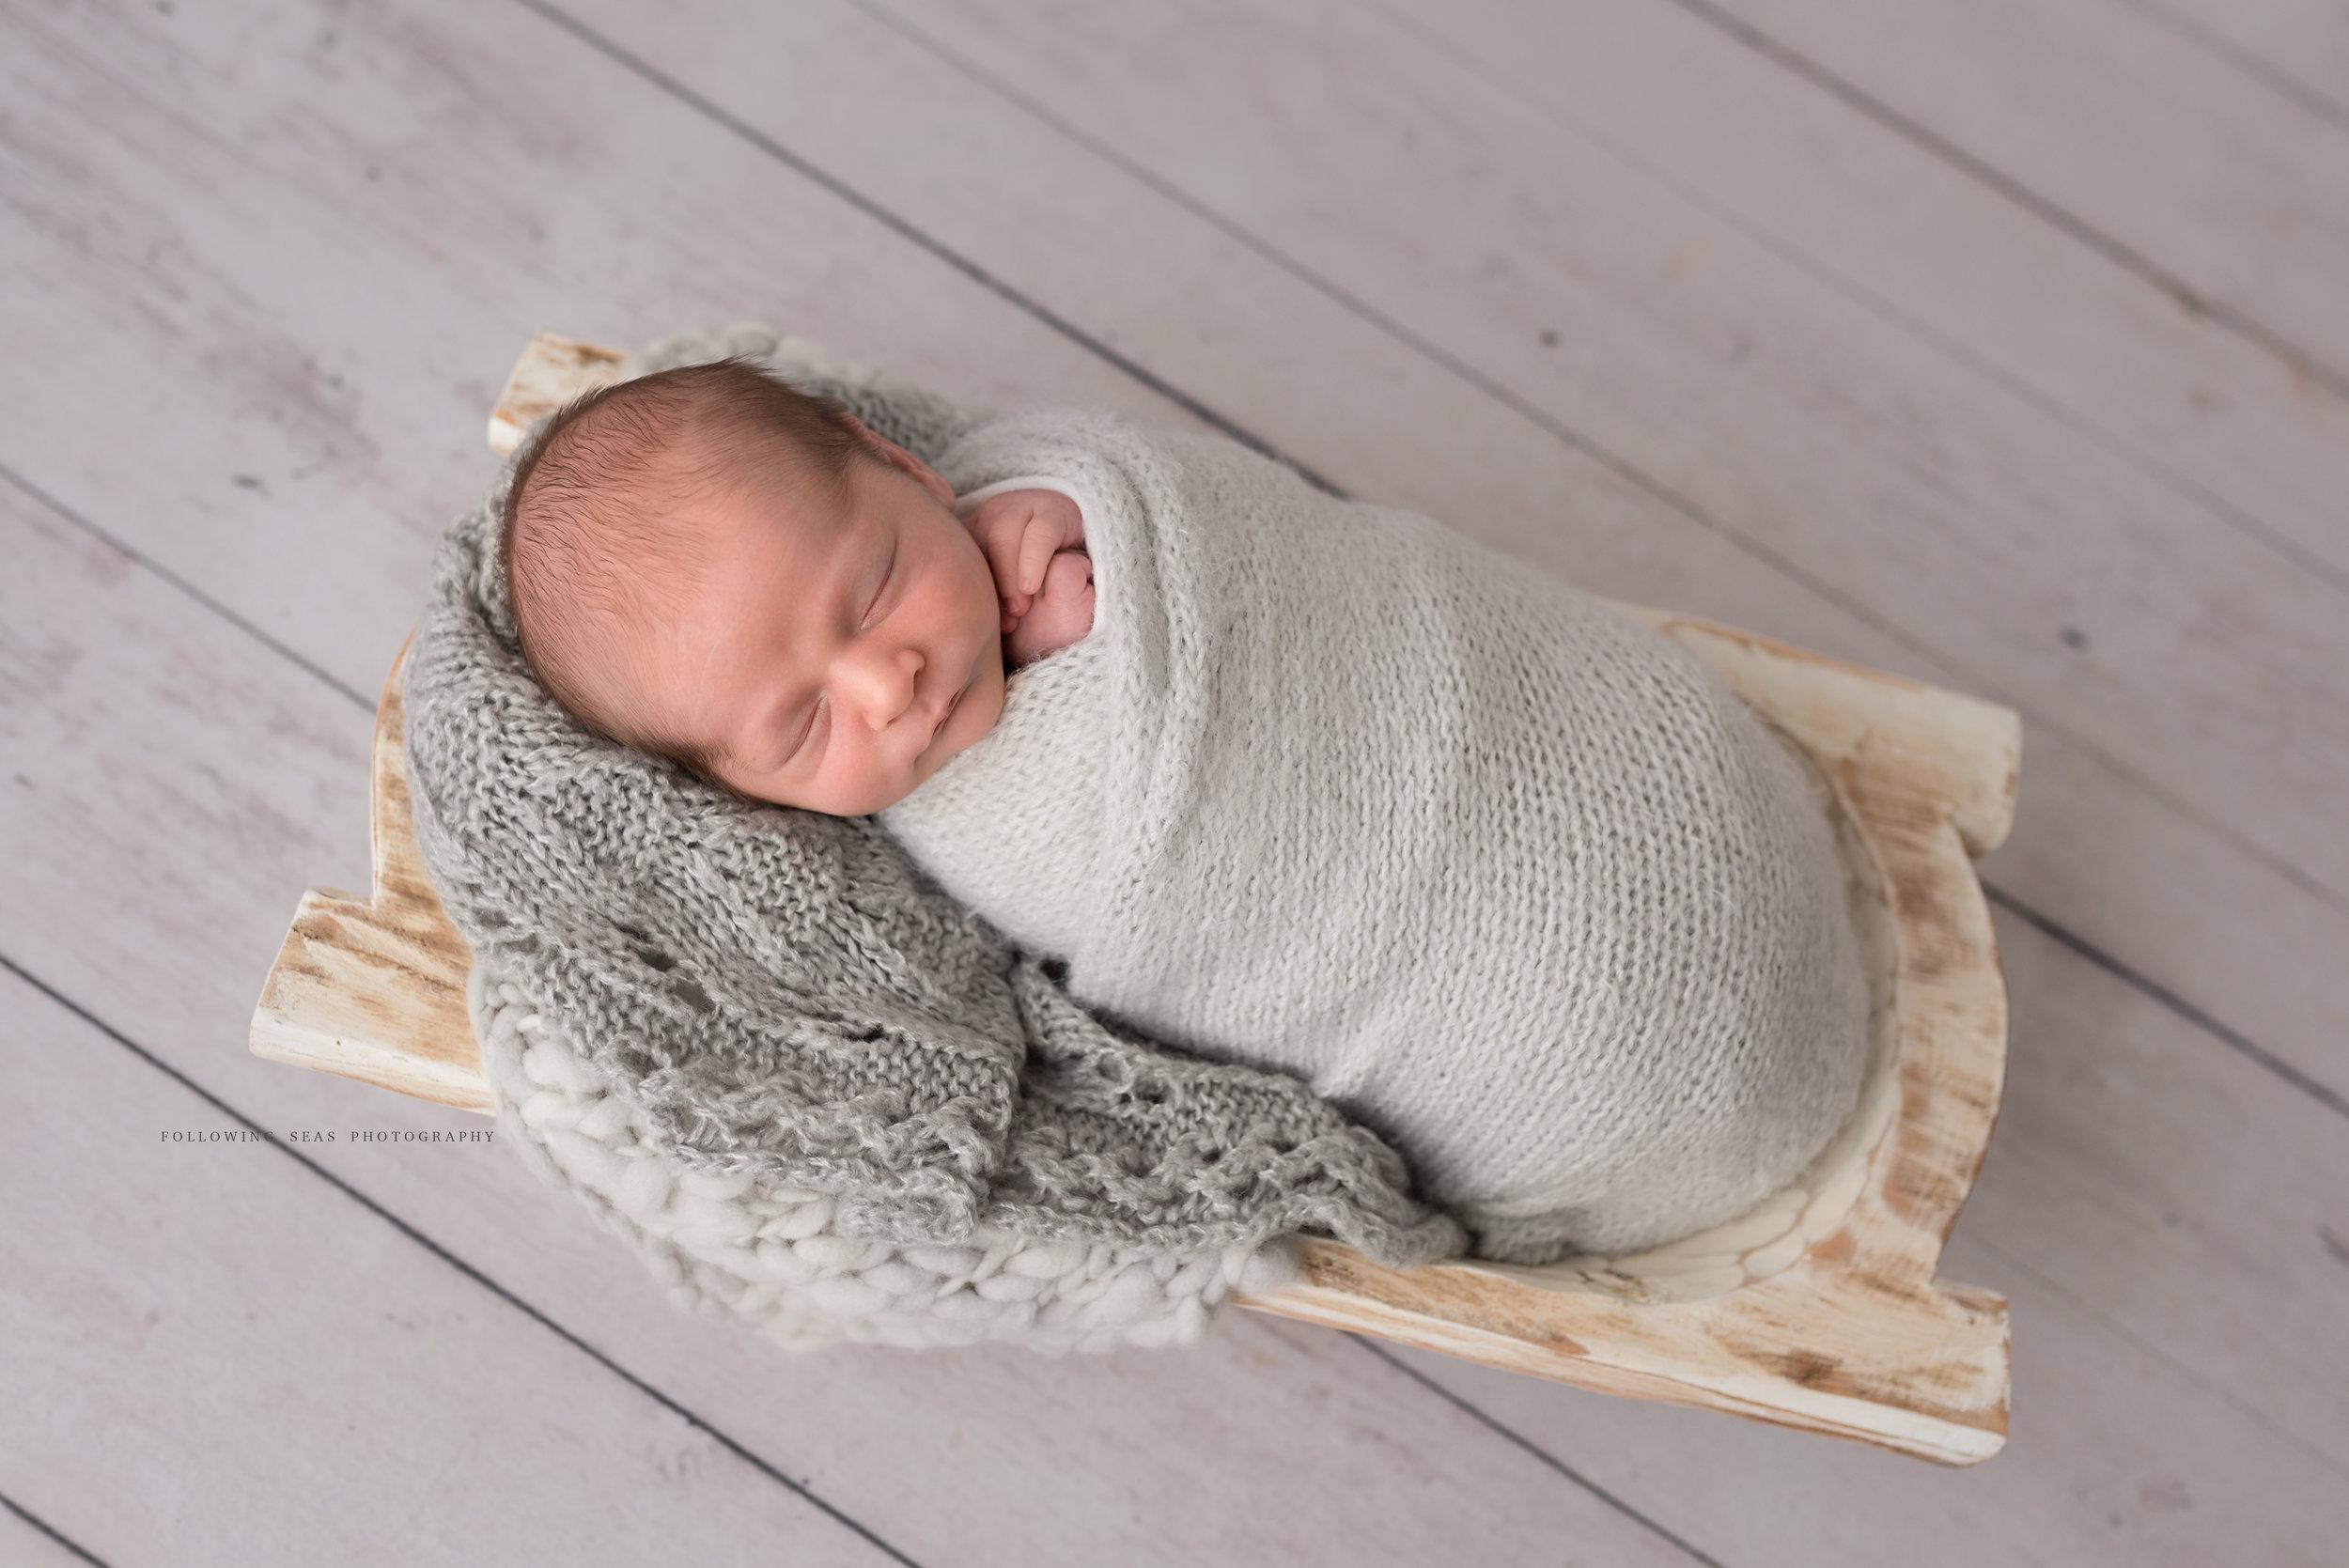 Charleston-Newborn-Photographer-Following-Seas-PhotographyFSP_7318.jpg